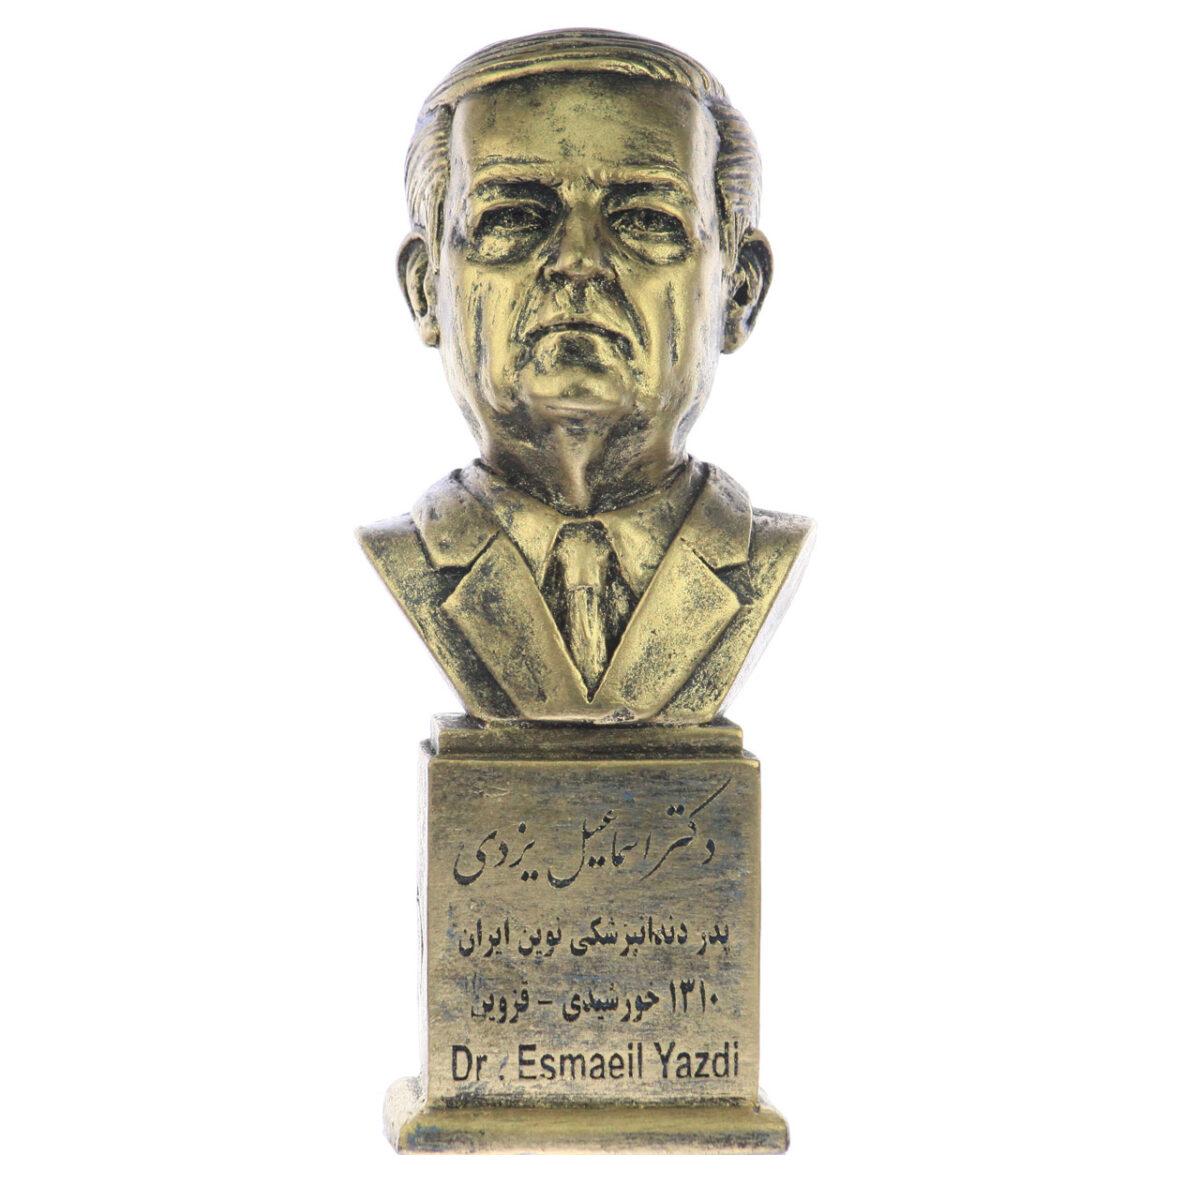 dr esmaeil yazdi b 1200x1200 - سردیس دکتر اسماعیل یزدی